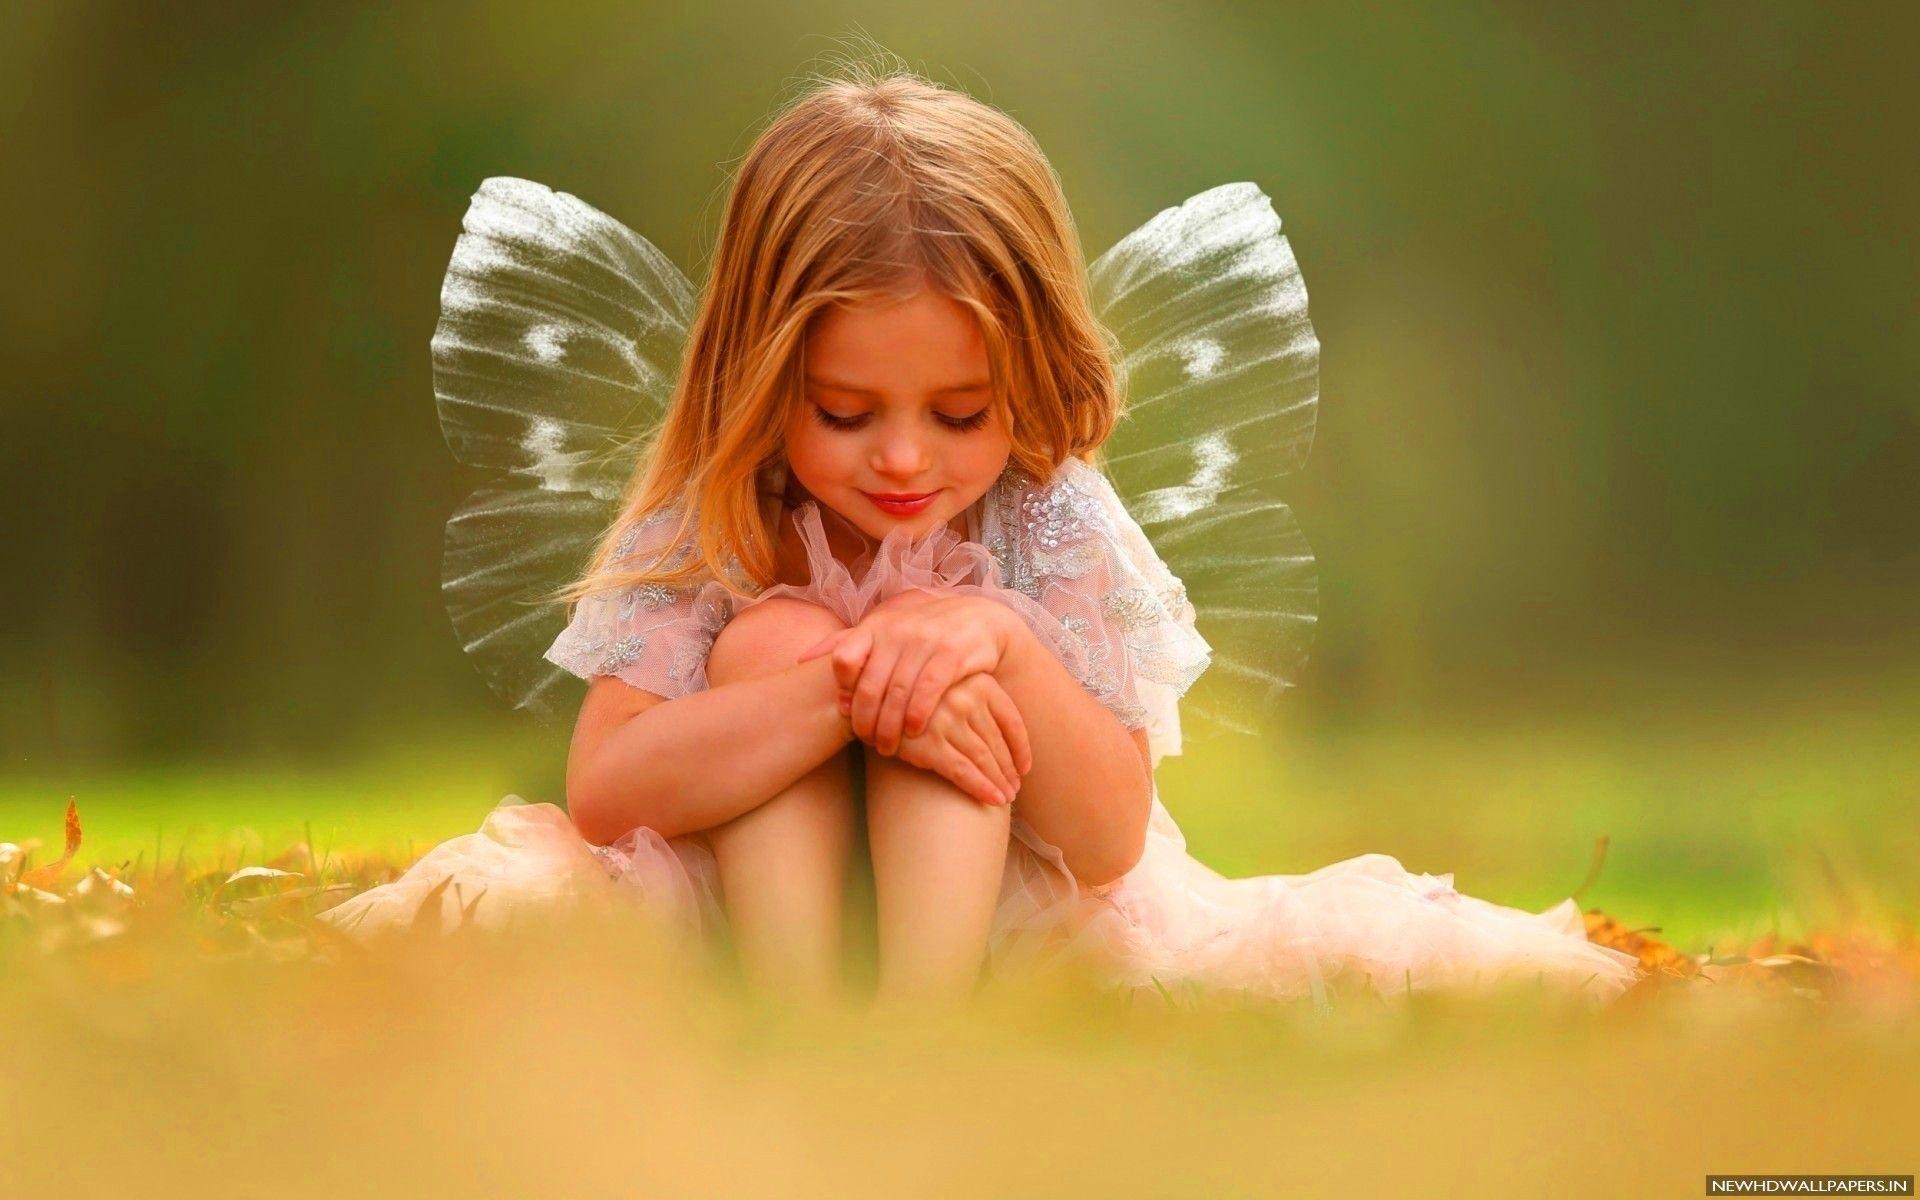 Pin By Parhai Koshilning On Fairies Cute Baby Girl Wallpaper Baby Girl Images Baby Girl Wallpaper